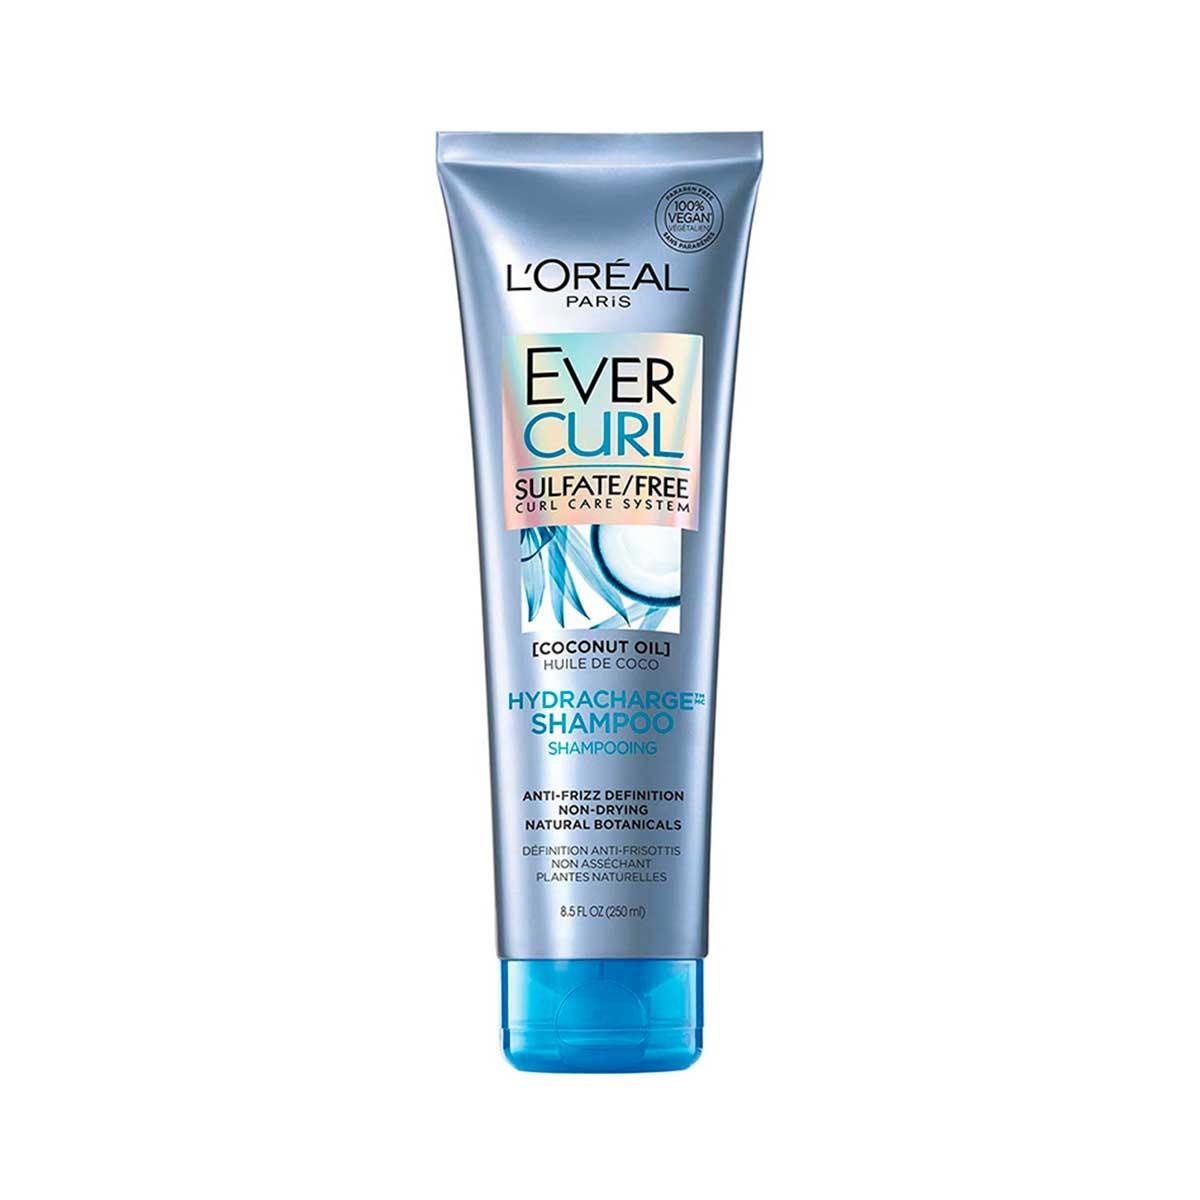 Shampoo Ever Curl Hydracharge 250ml 250ml